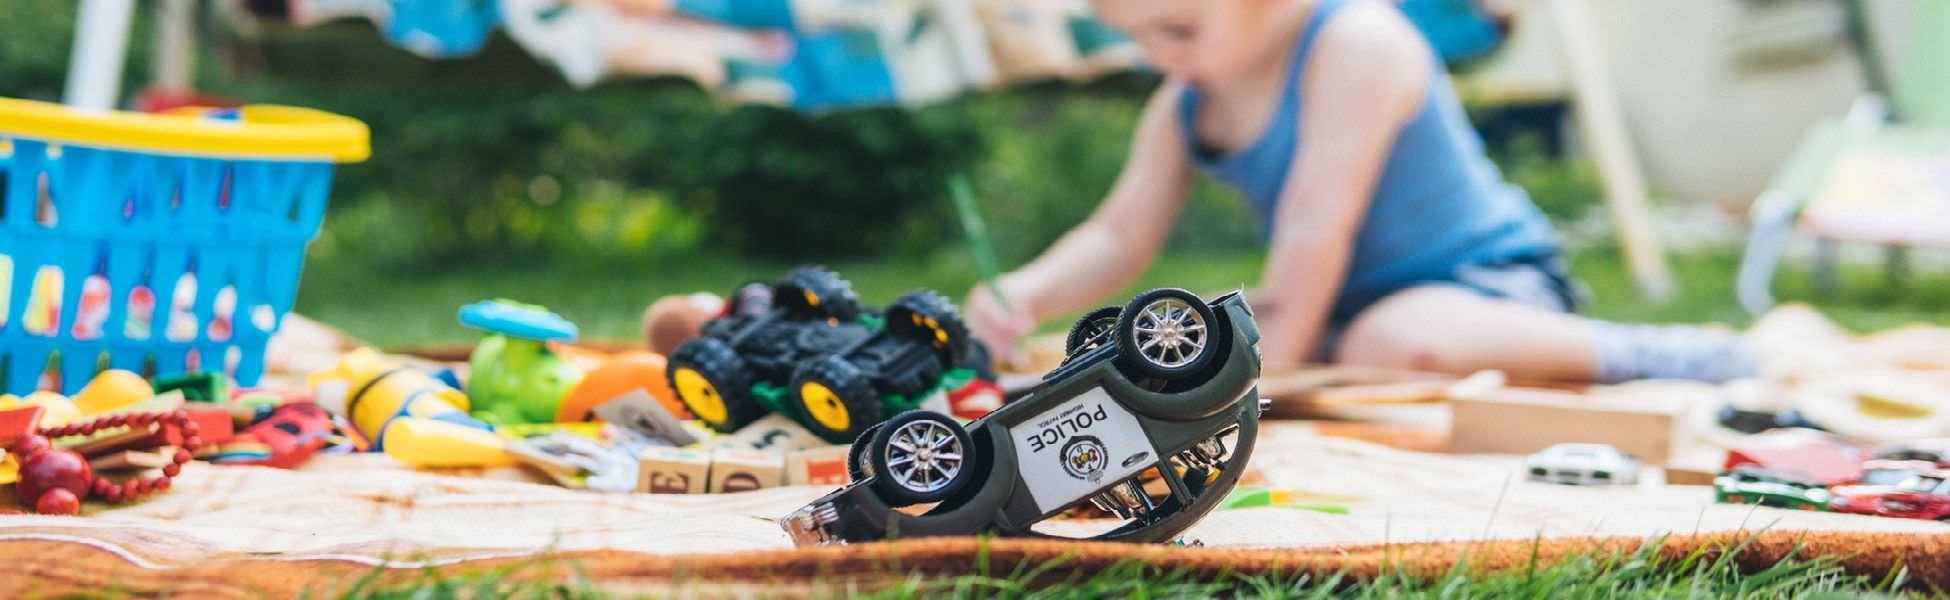 hračky mini